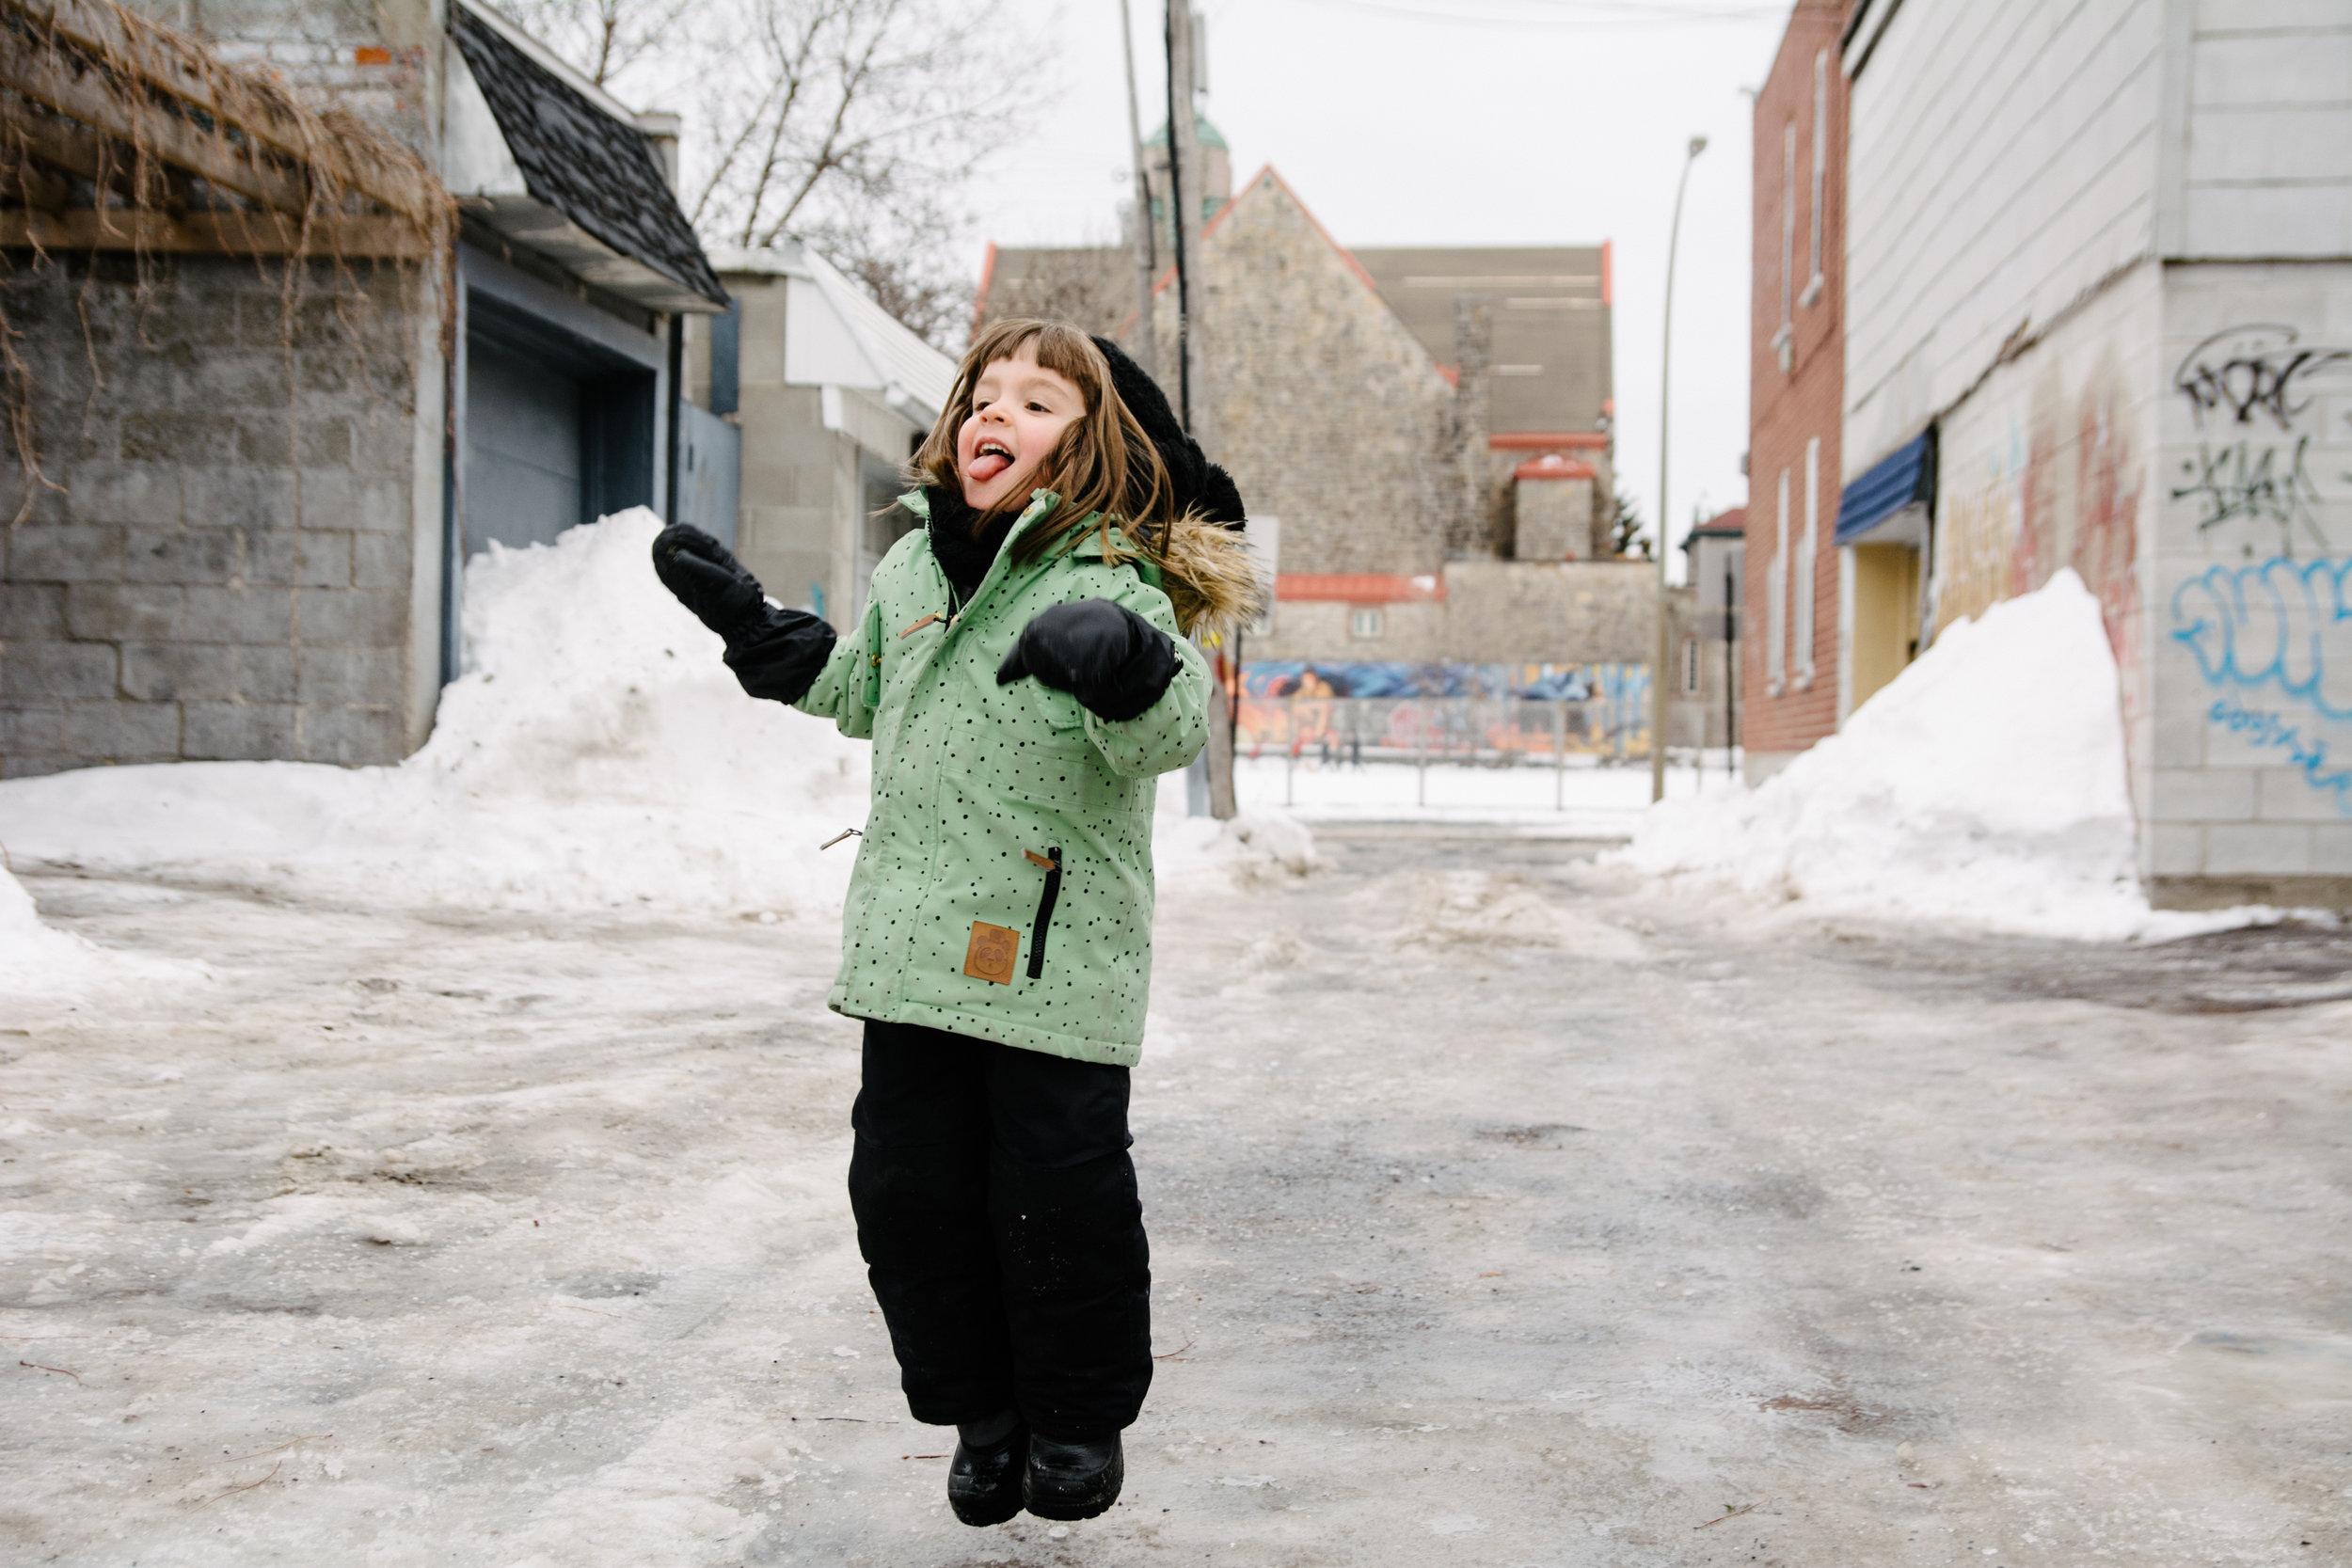 hiver_photo-dune-gamine-qui-sourit-a-pleine-dents-photographe-famille-lifestyle-montreal-4.jpg